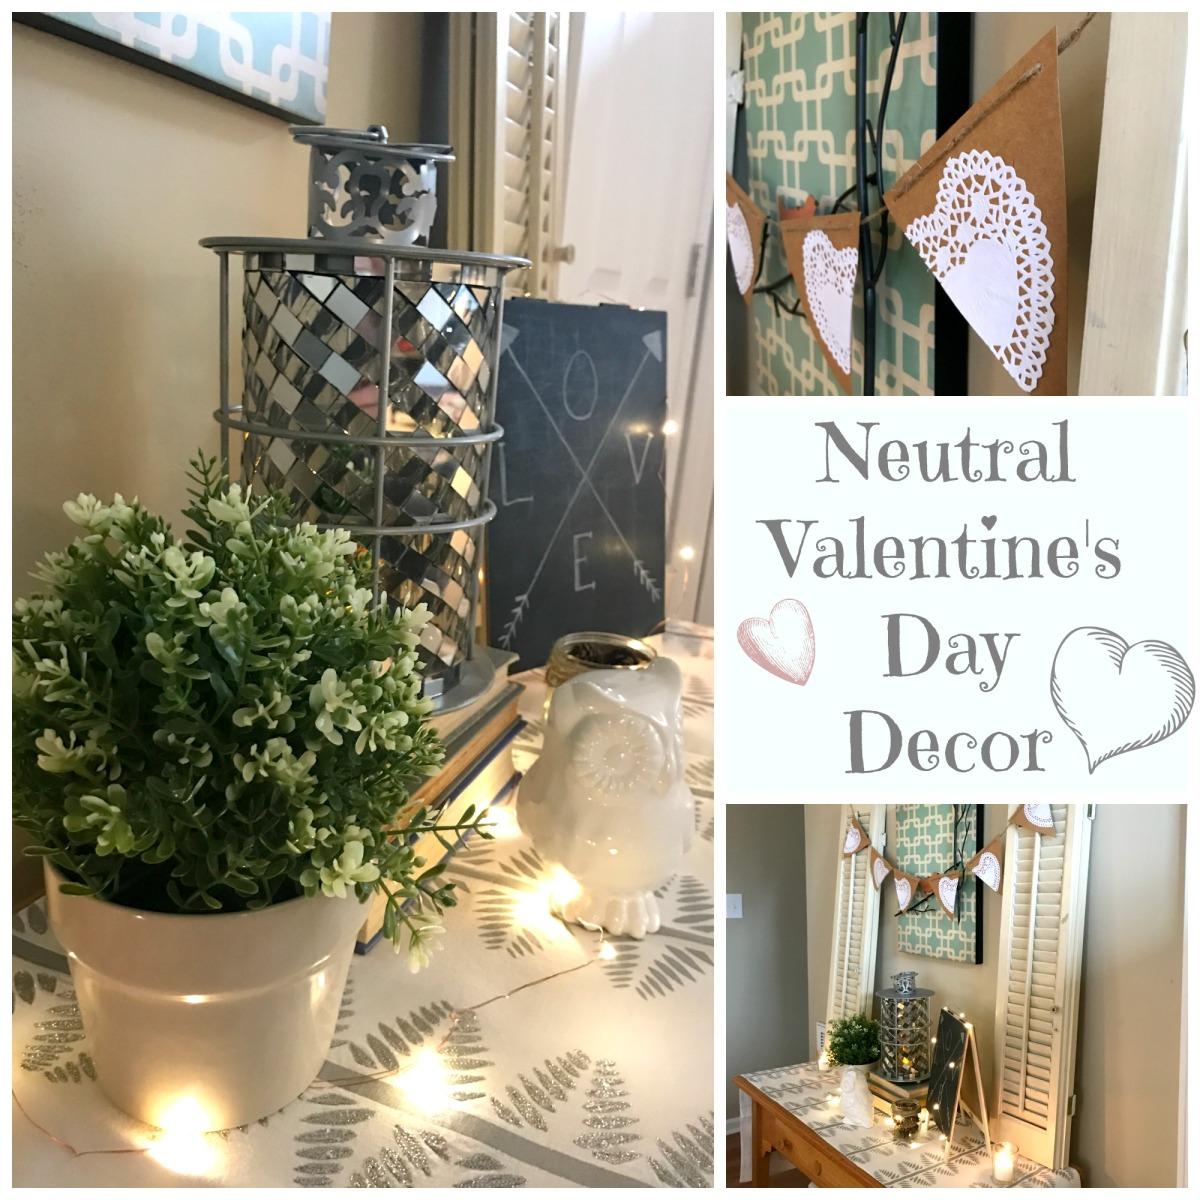 Valentine's Day Decor {Cozy And Neutral}